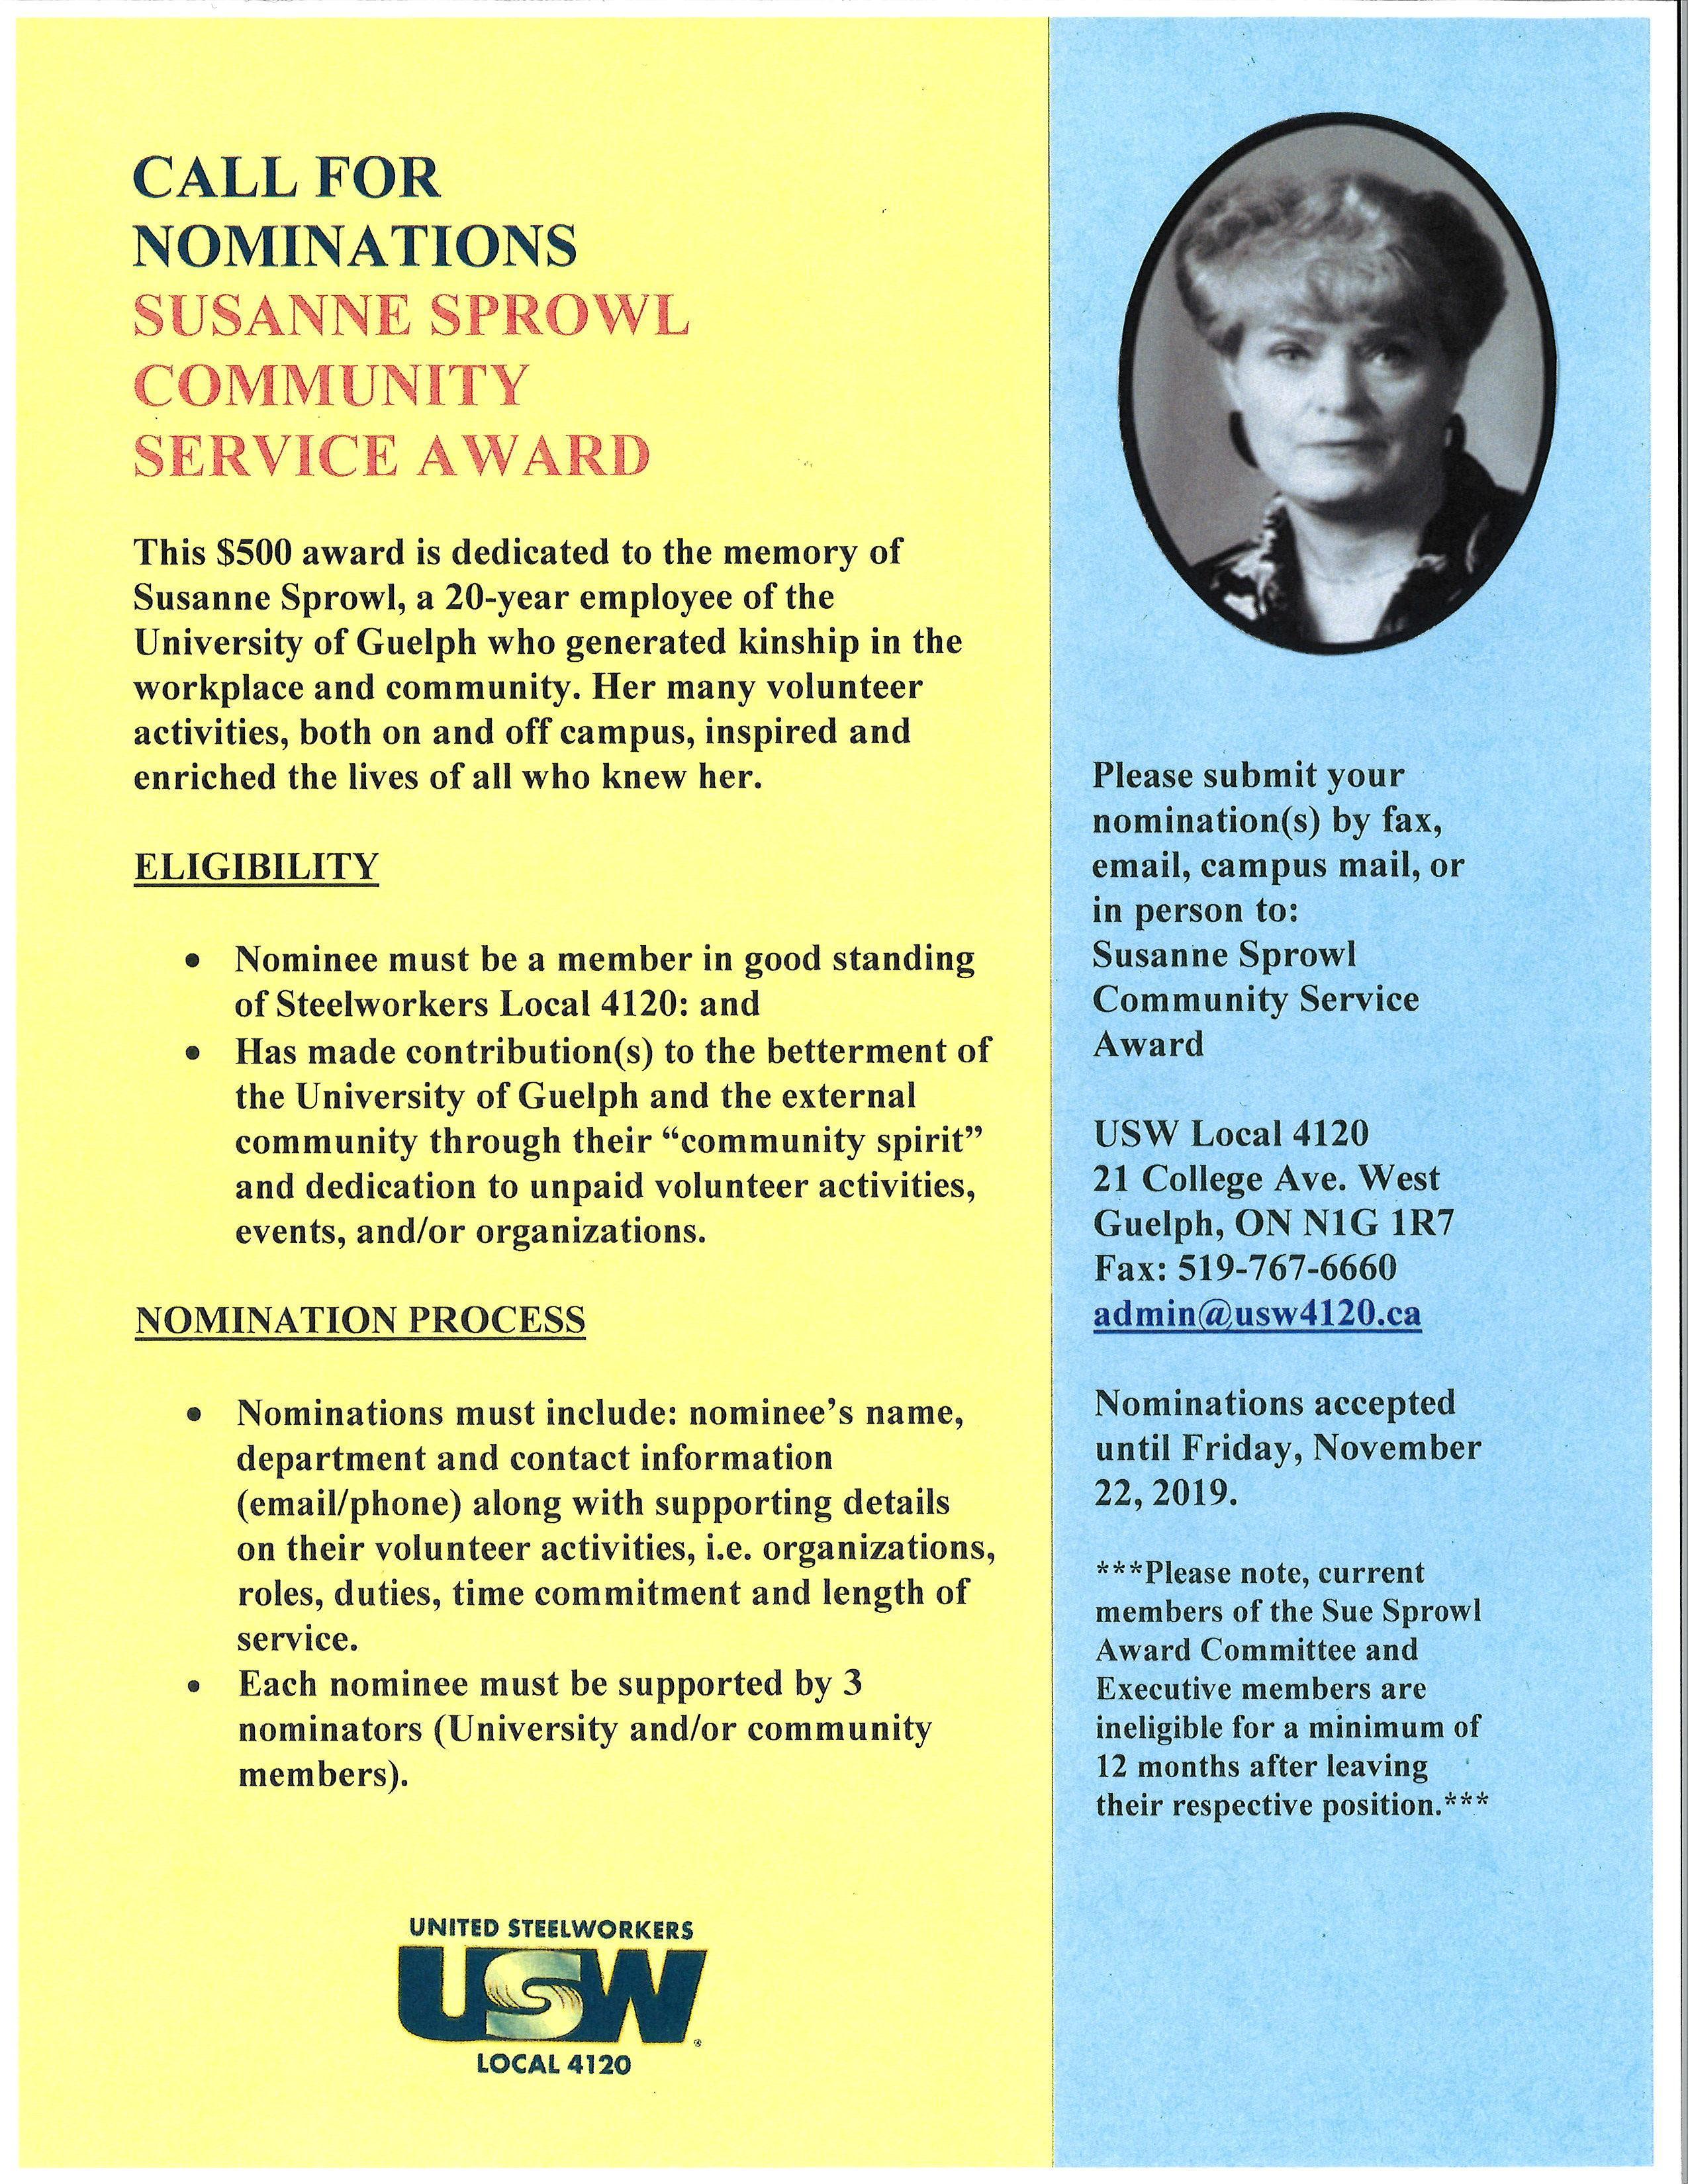 Susanne Sprowl Community Service Award